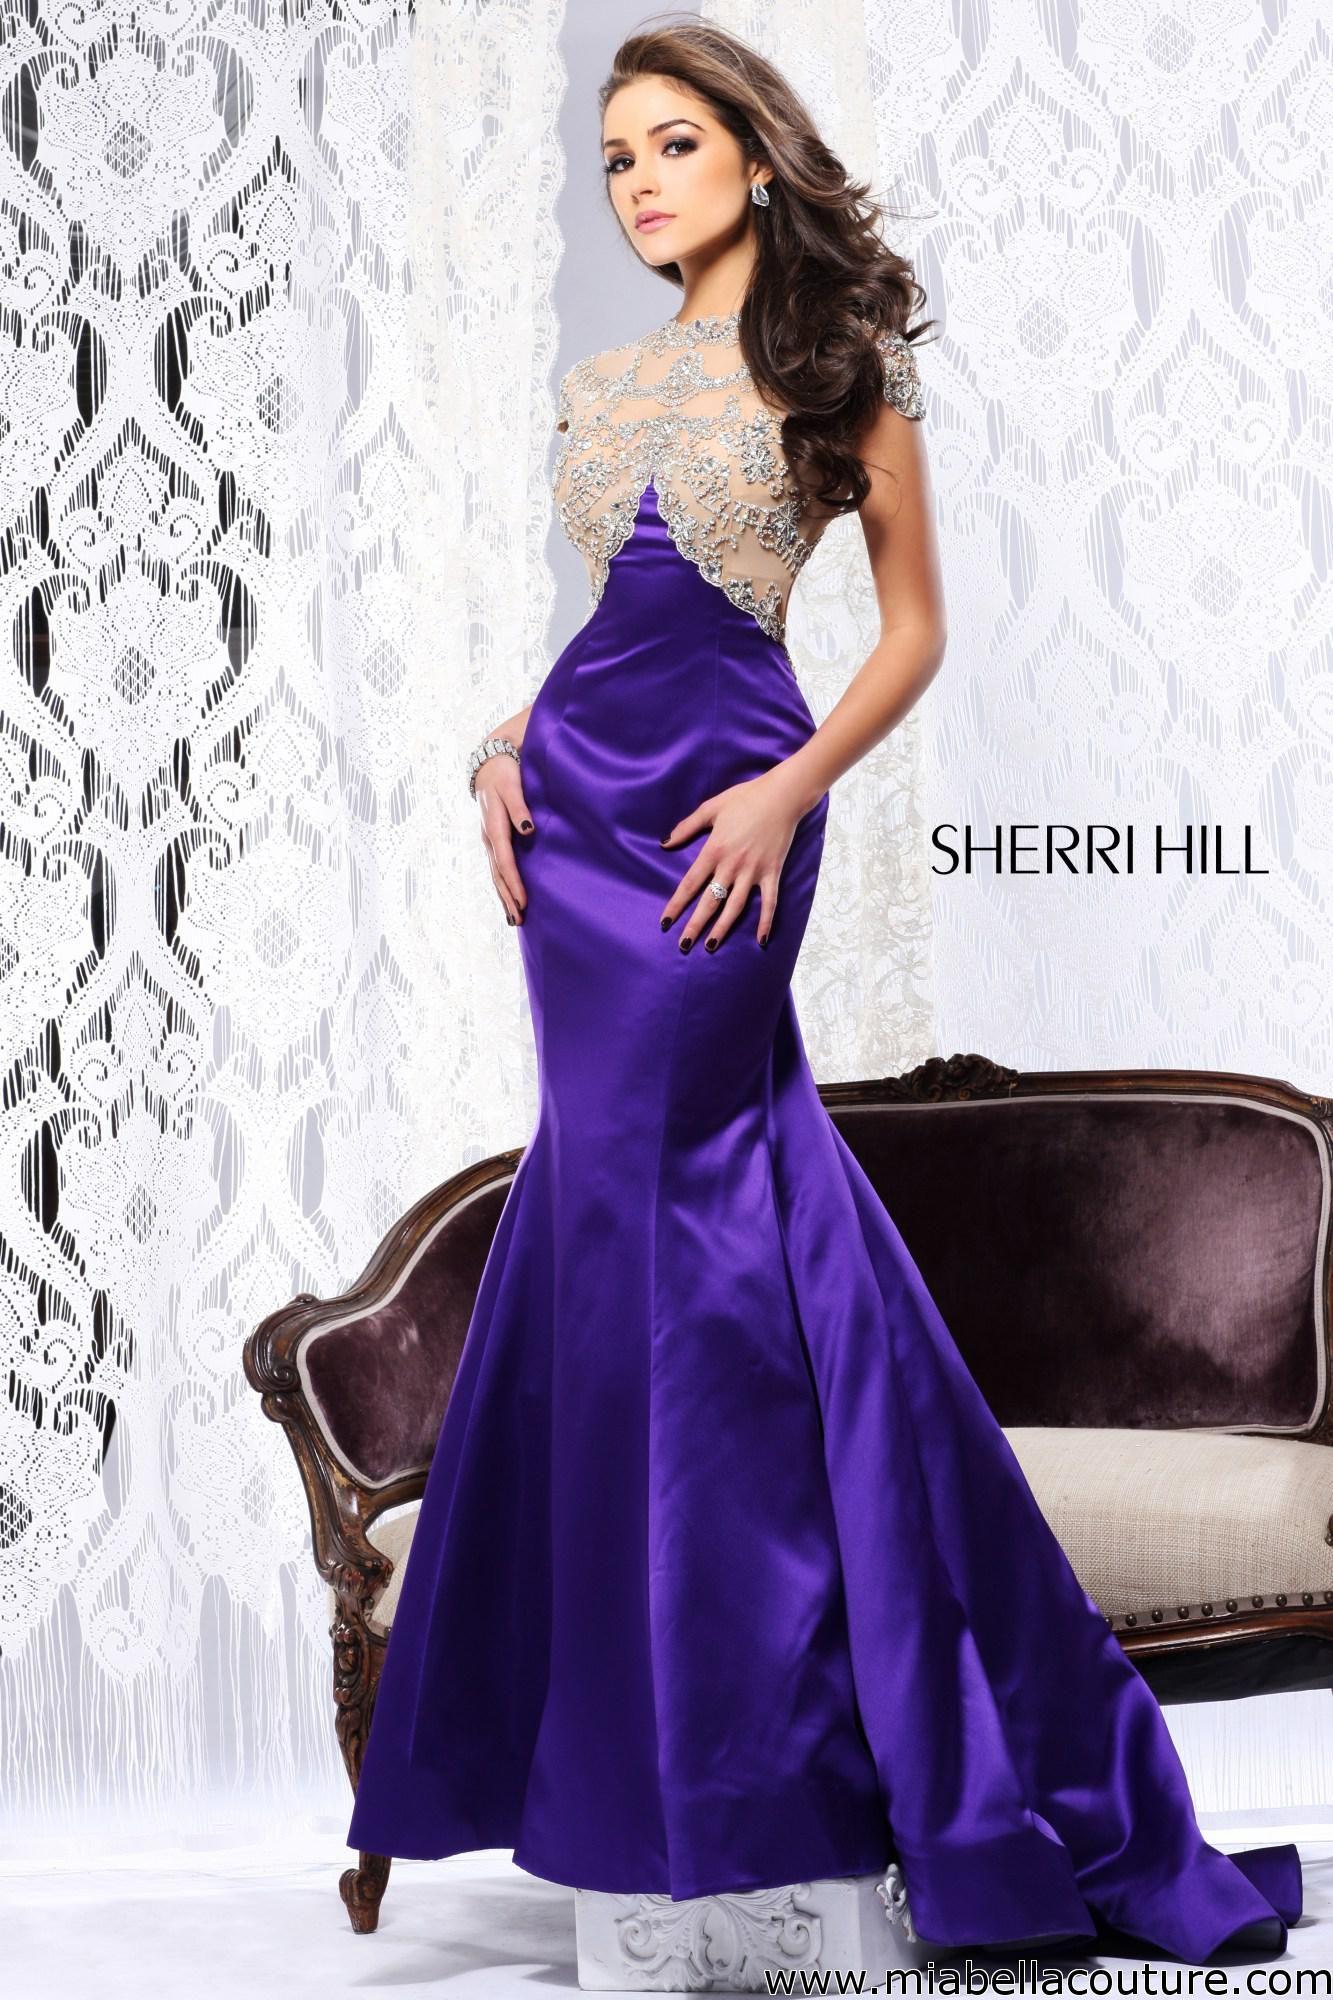 Sherri Hill style # 17 #SHERRIHILLSTYLE love love love